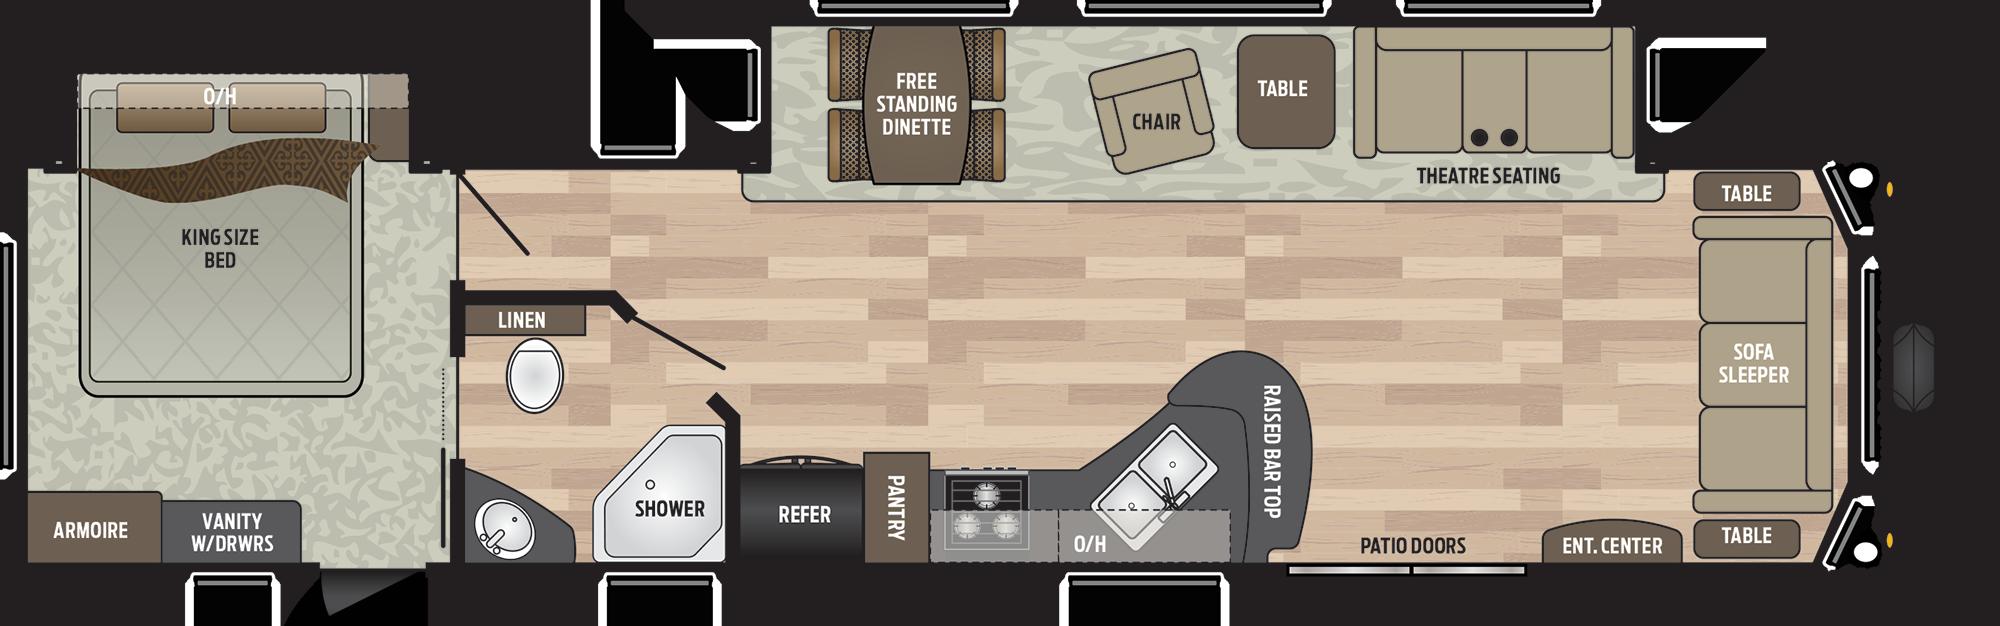 Download Residence 401fden Destination Trailer Front Living Travel Trailer Floor Plans Png Image With No Background Pngkey Com